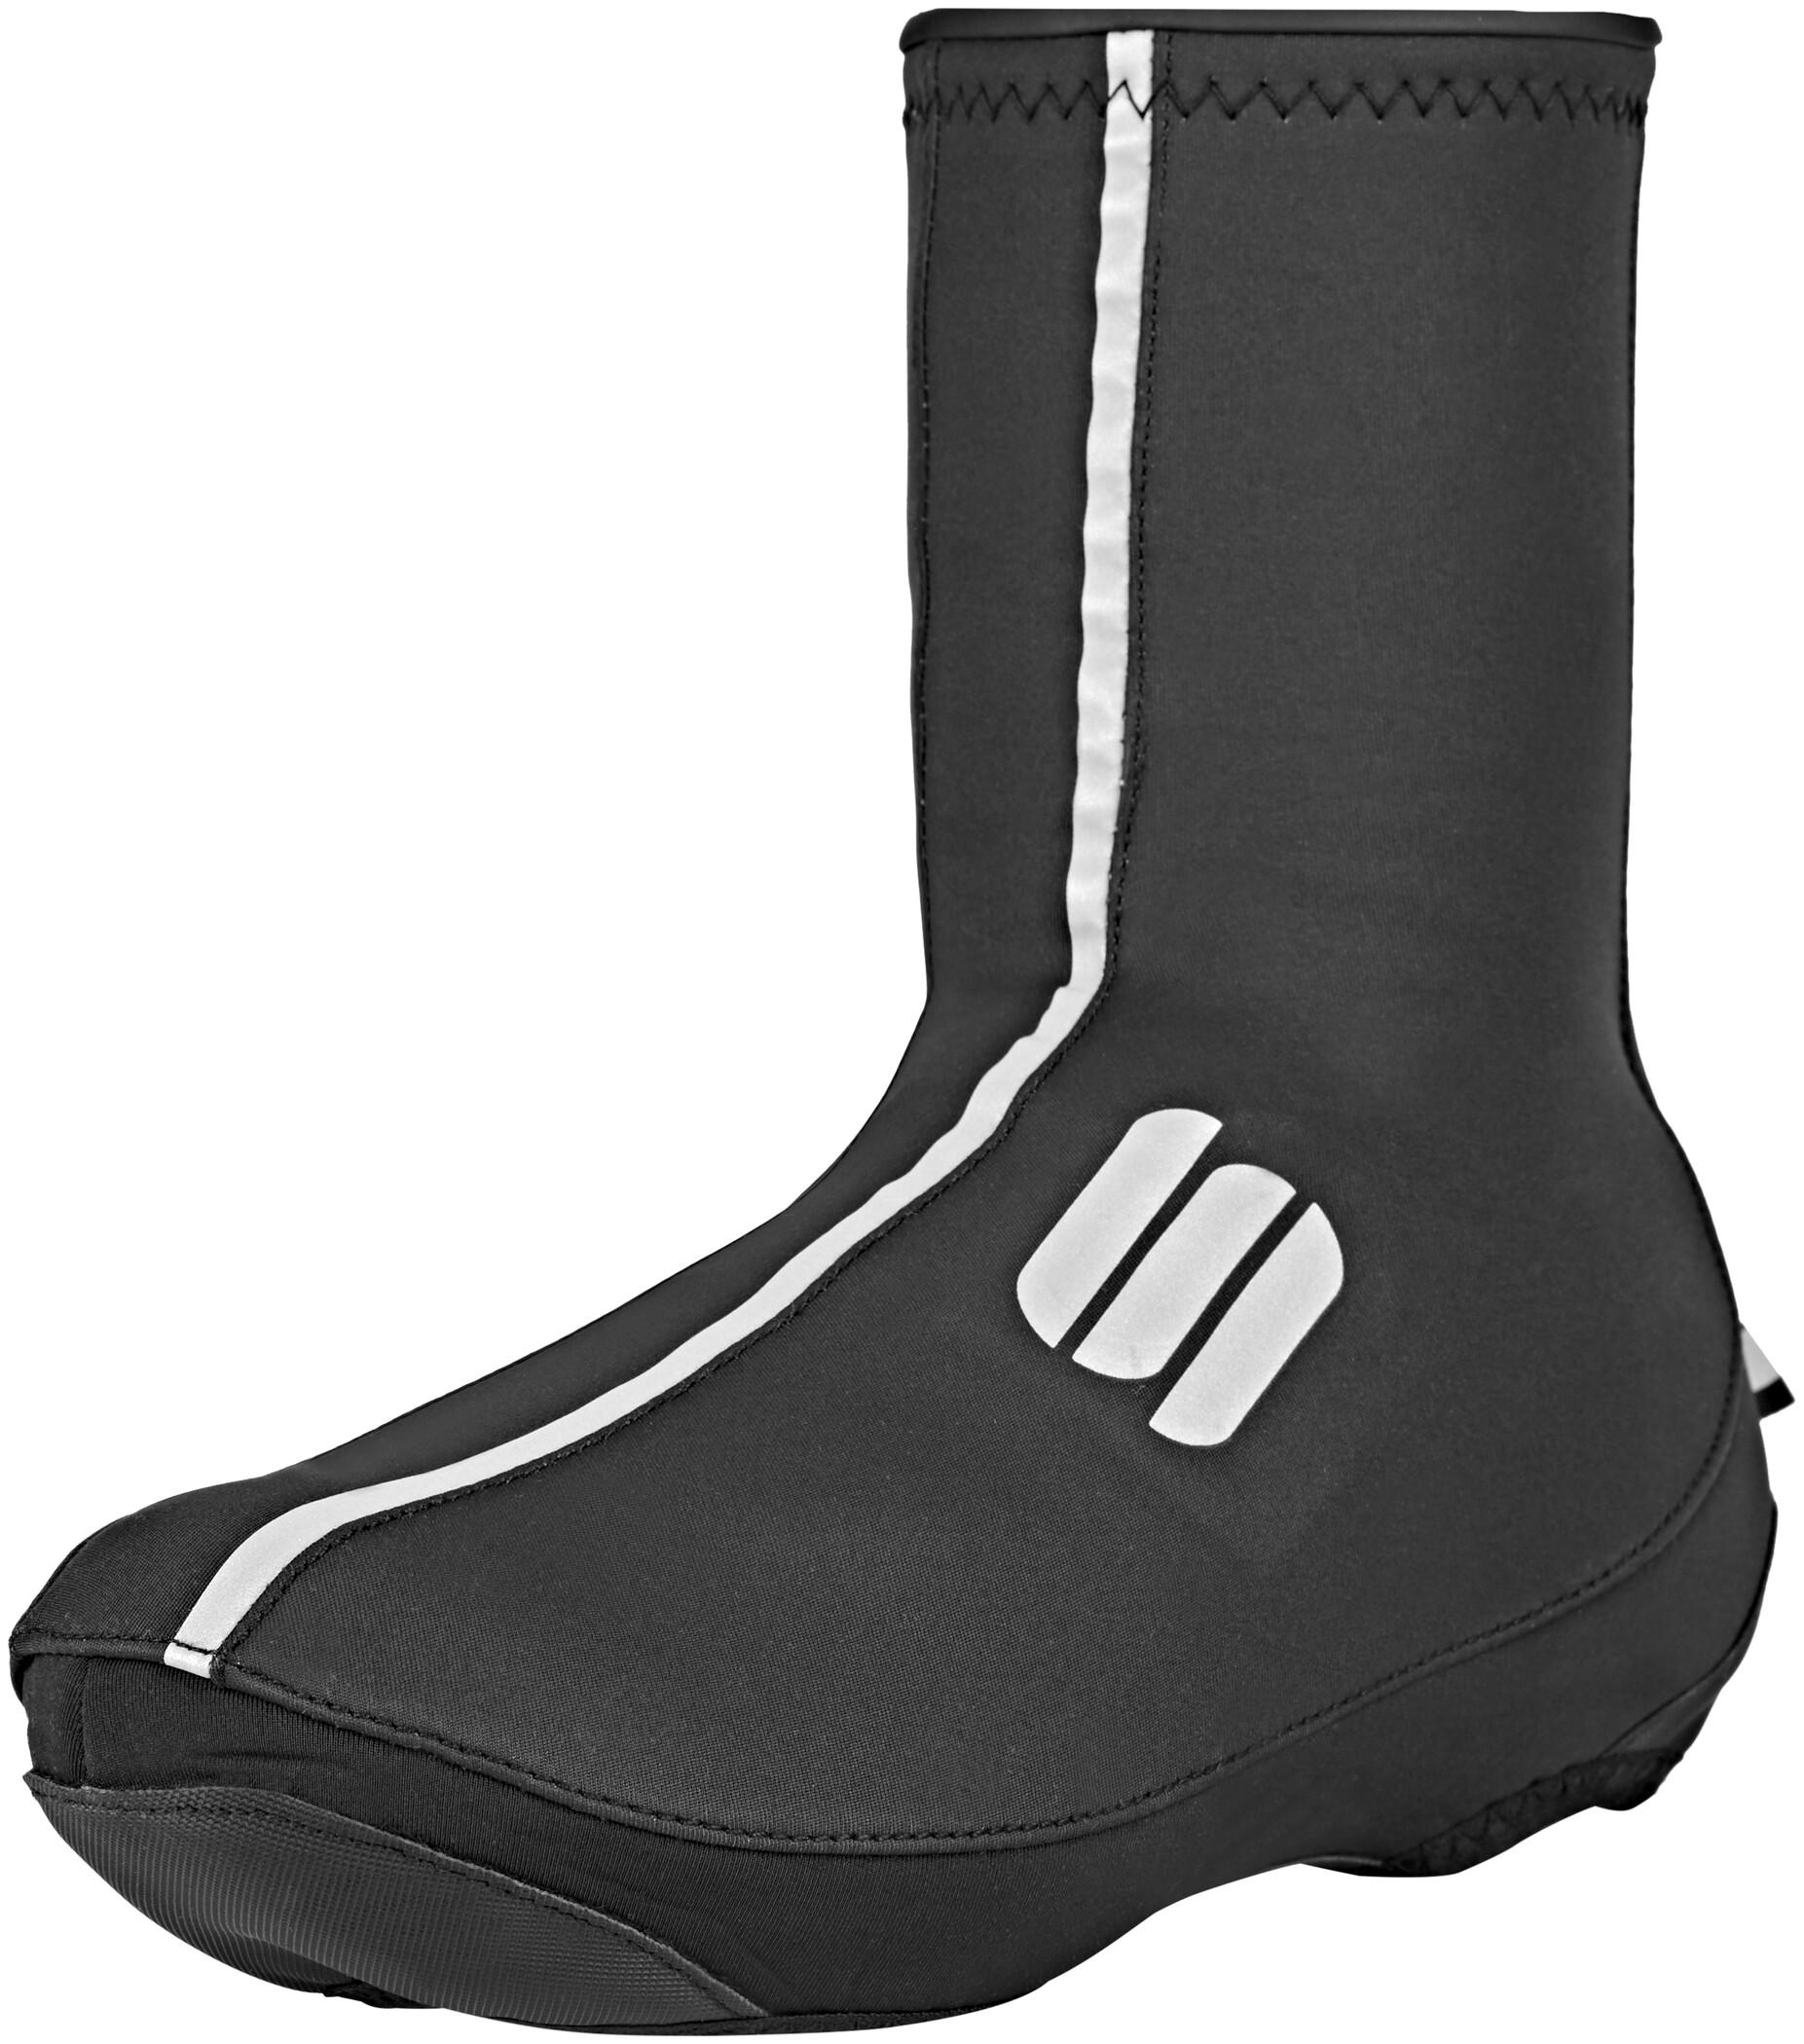 Sportful Reflex 2 Skoovertræk, black | shoecovers_clothes